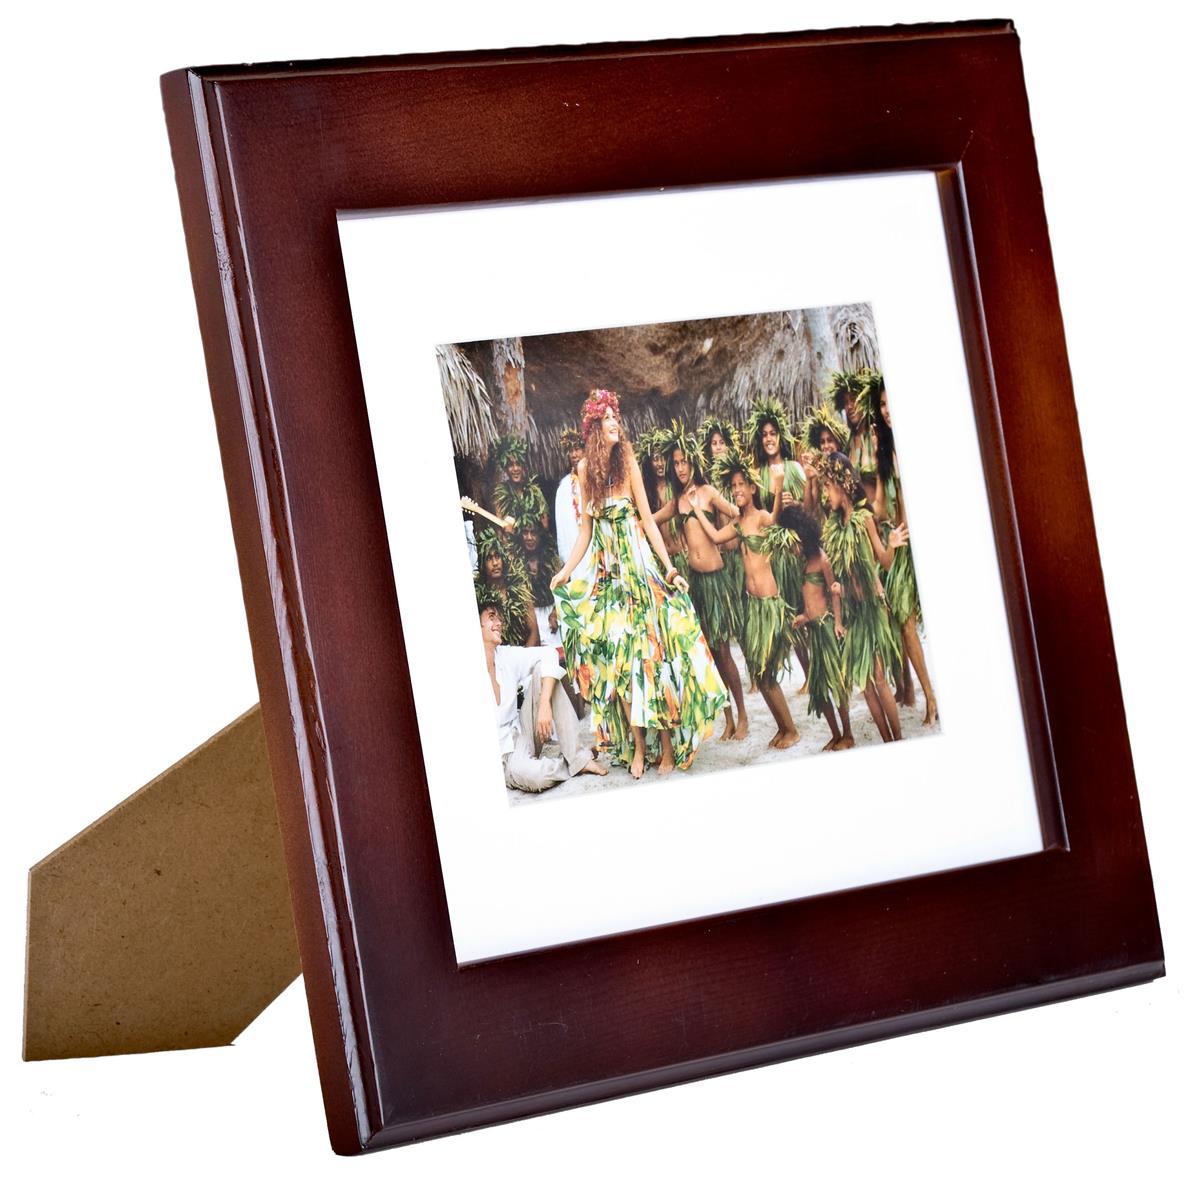 5 Quot X 7 Quot Wood Picture Frames Mahogany Finish